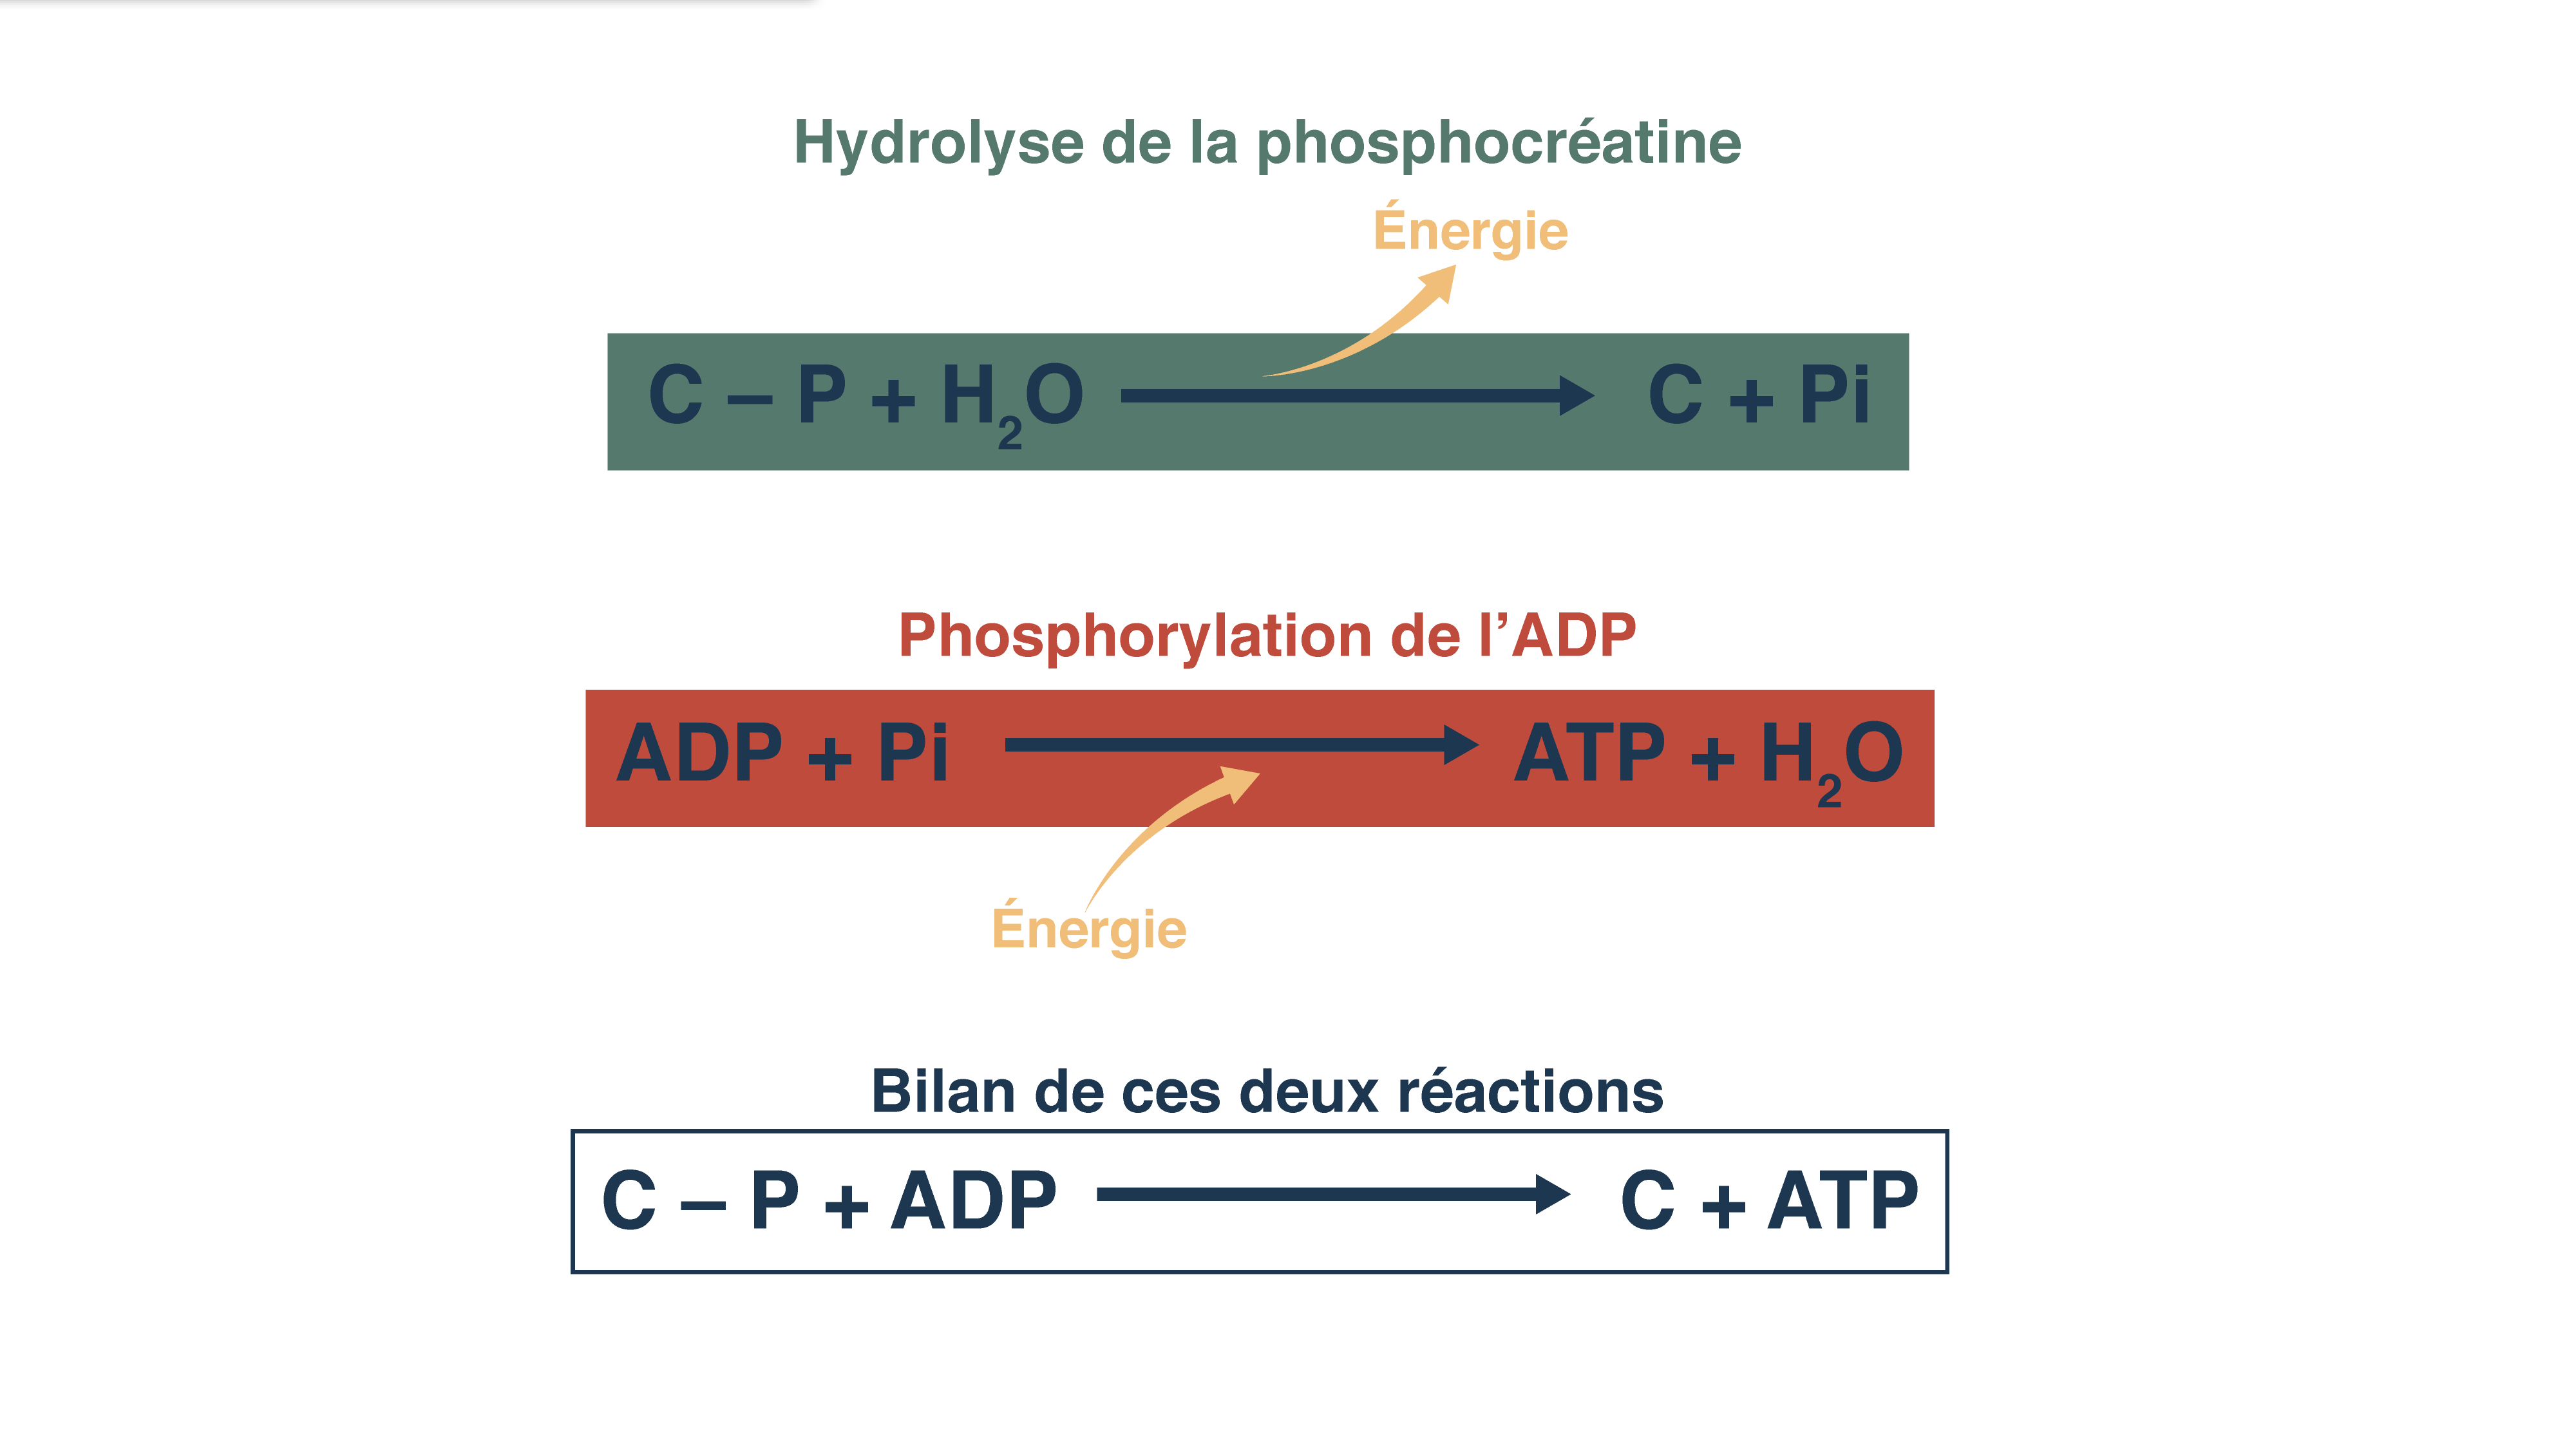 Réaction de phosphocréatine et phosphorylation